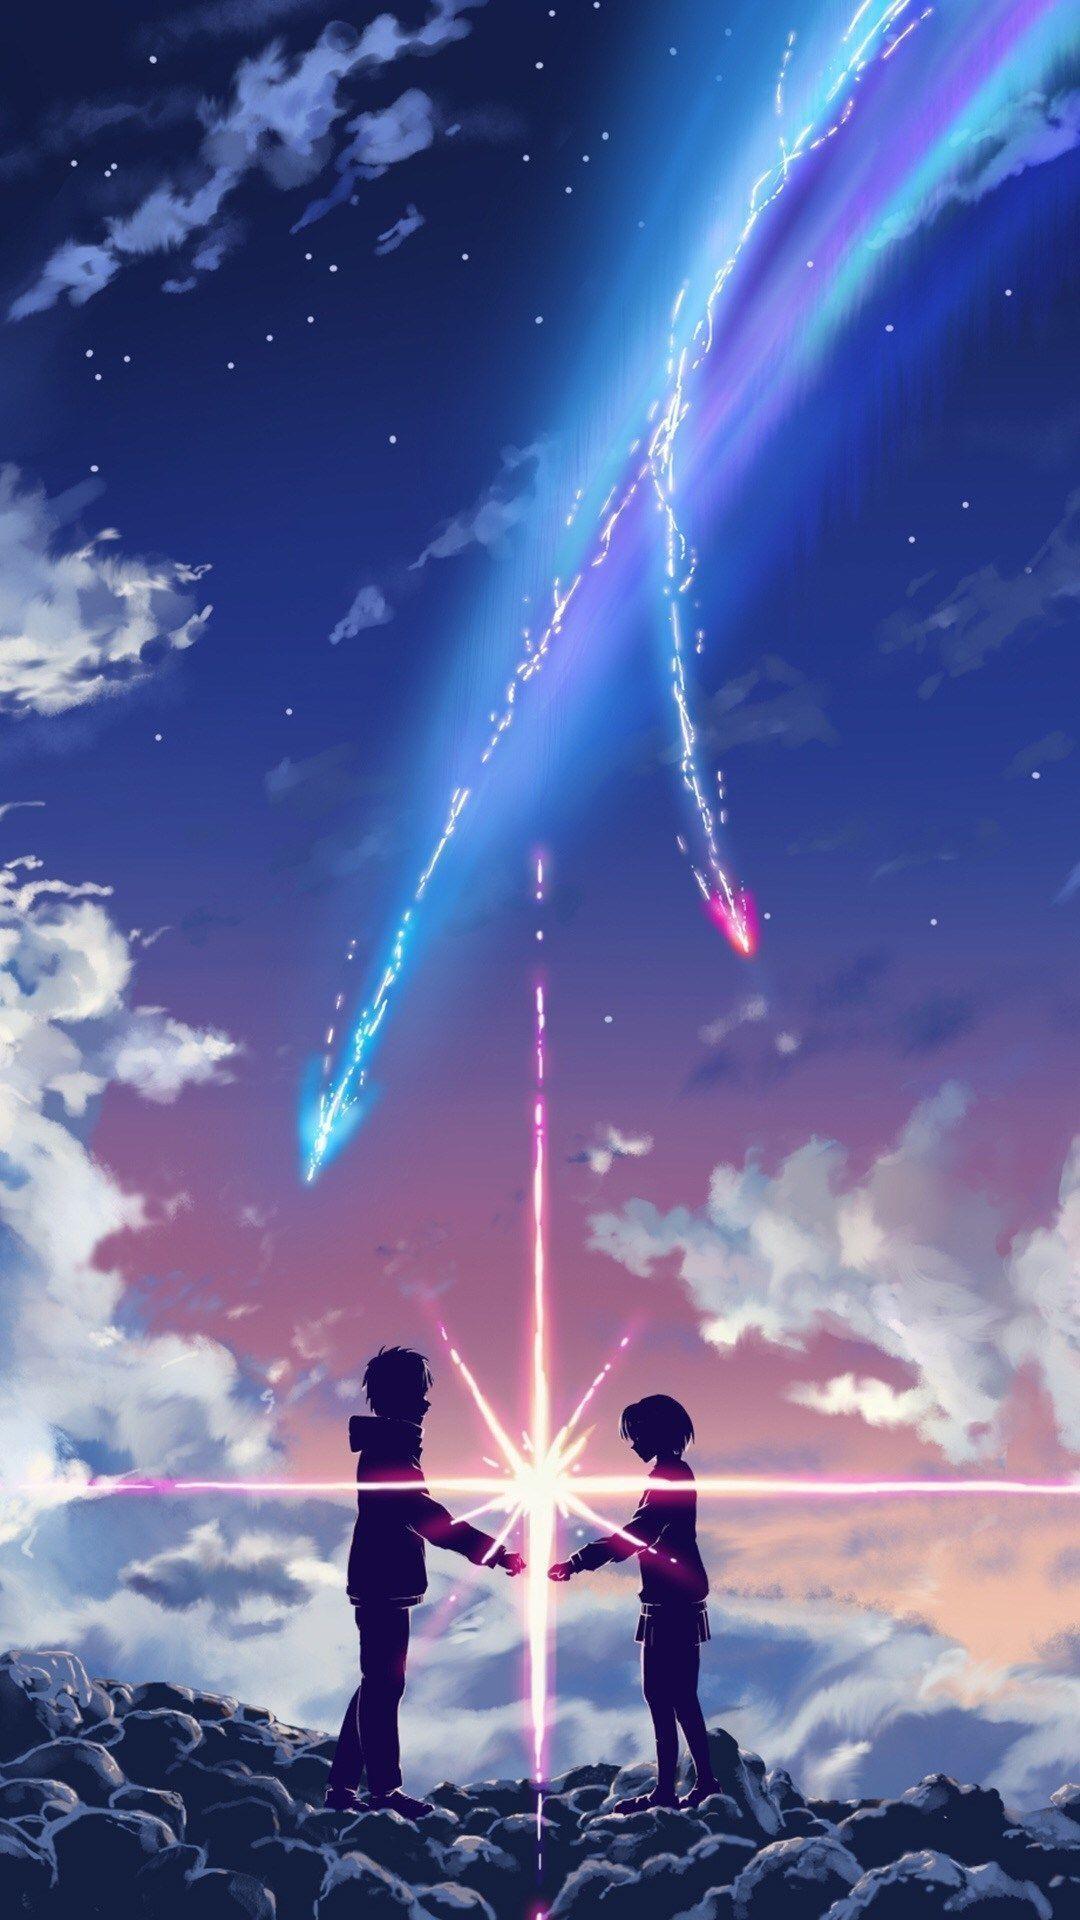 Anime Wallpaper Phone Wallpaper Nice In 2020 Anime Backgrounds Wallpapers Anime Wallpaper Iphone Anime Wallpaper Download